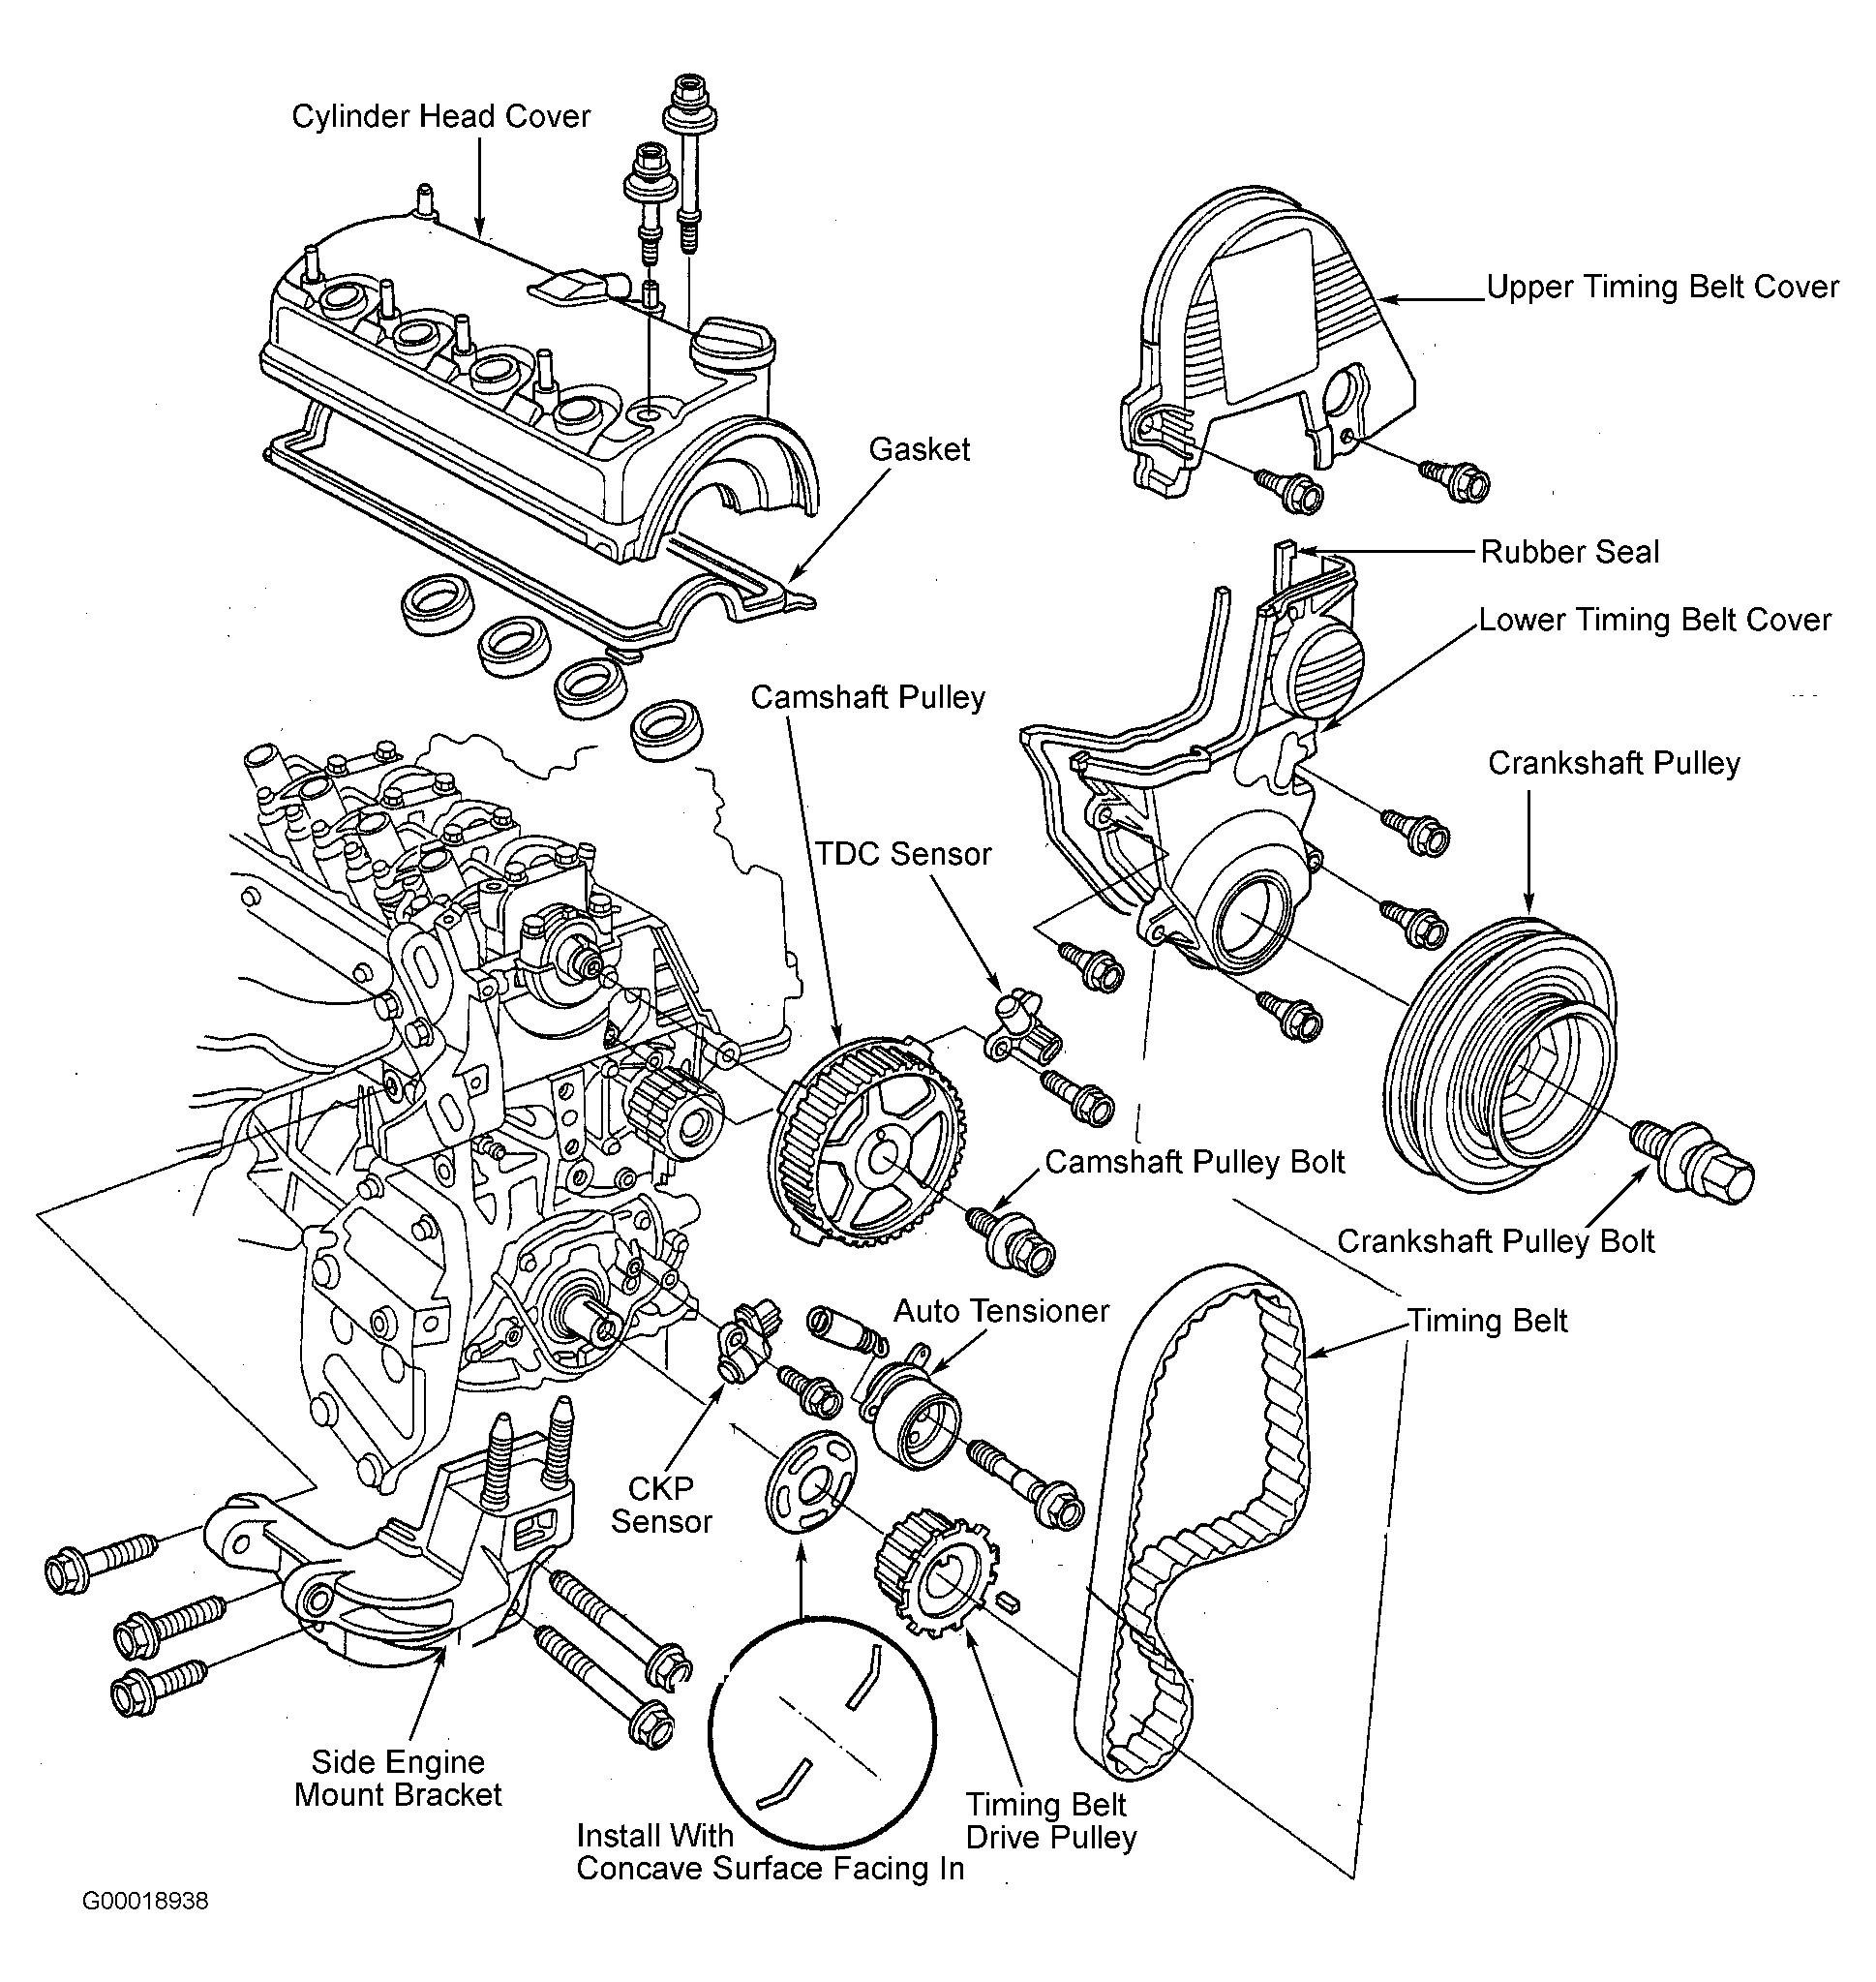 2009 Honda Civic Engine Diagram - Wiring Diagram Directory on toyota 3.5 engine diagram, gm 3.5 engine diagram, tecumseh 3.5 engine diagram, chevy 3.5 engine diagram, dodge 3.5 engine diagram, kia 3.5 engine diagram, nissan 3.5 engine diagram, oldsmobile 3.5 engine diagram, isuzu 3.5 engine diagram, hummer 3.5 engine diagram,